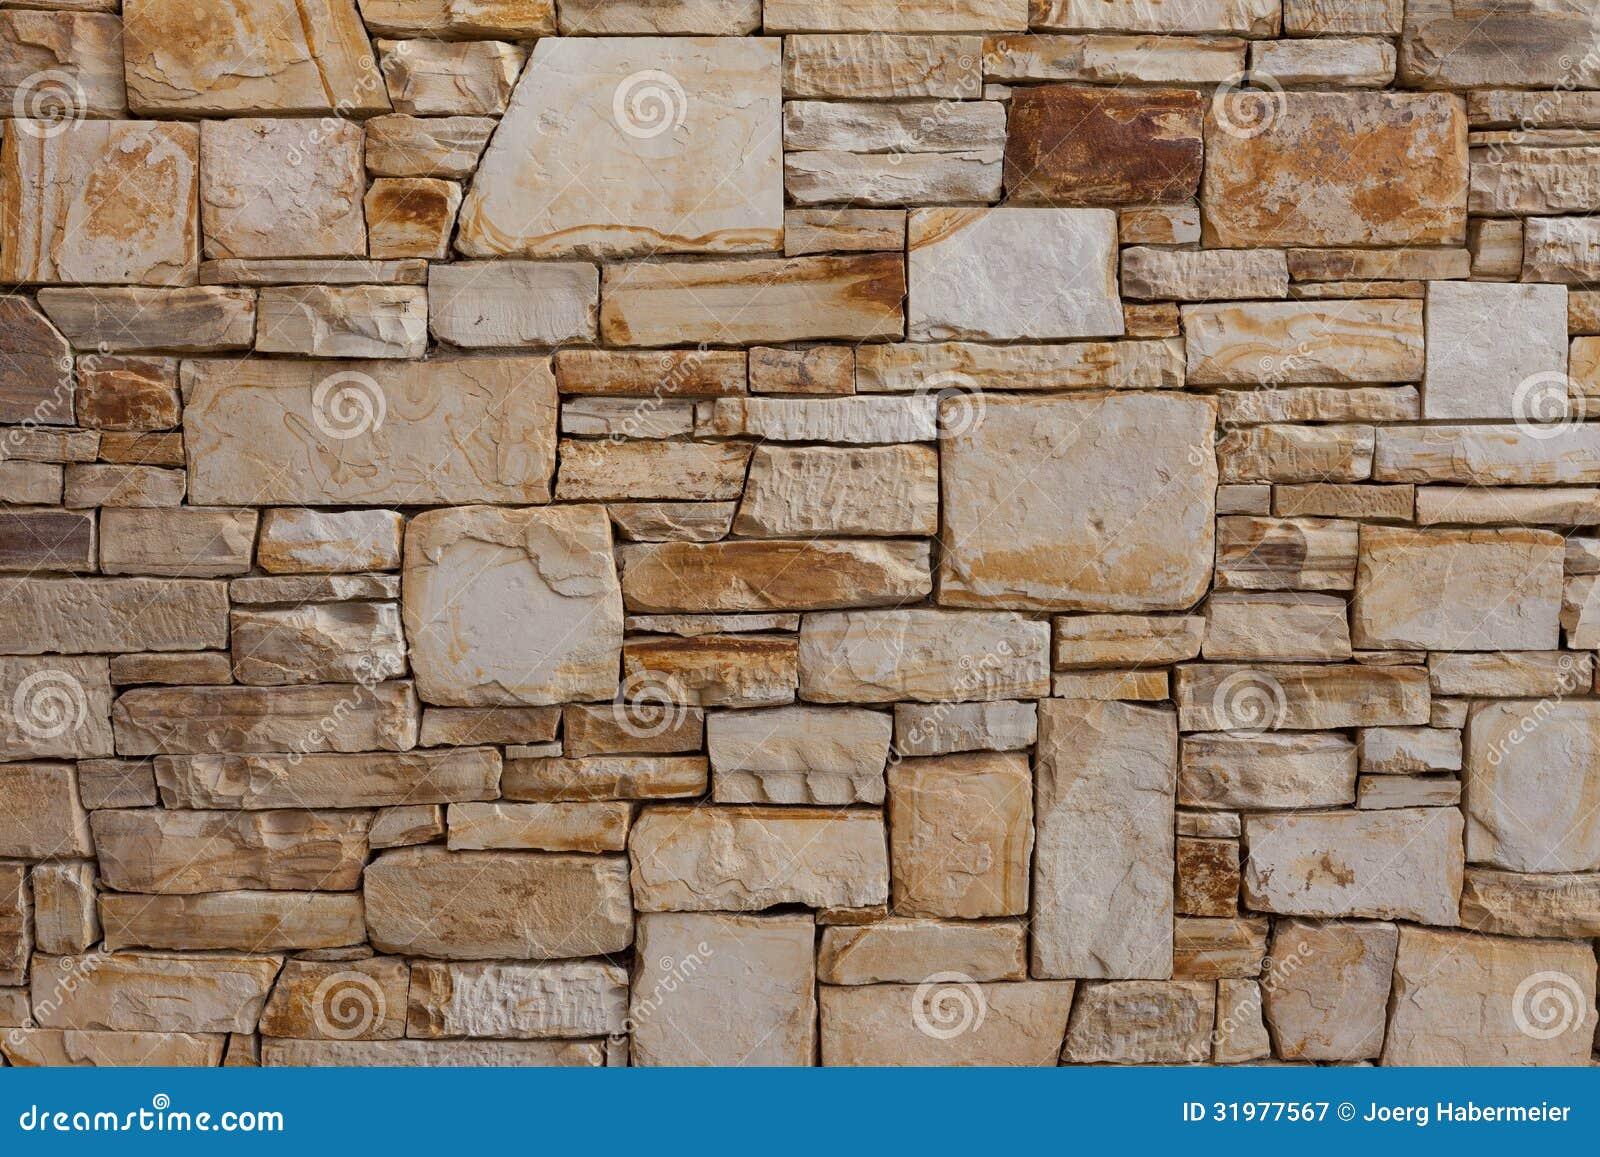 Luxury natural stone brick wall pattern background stock - Imitacion a ladrillo ...